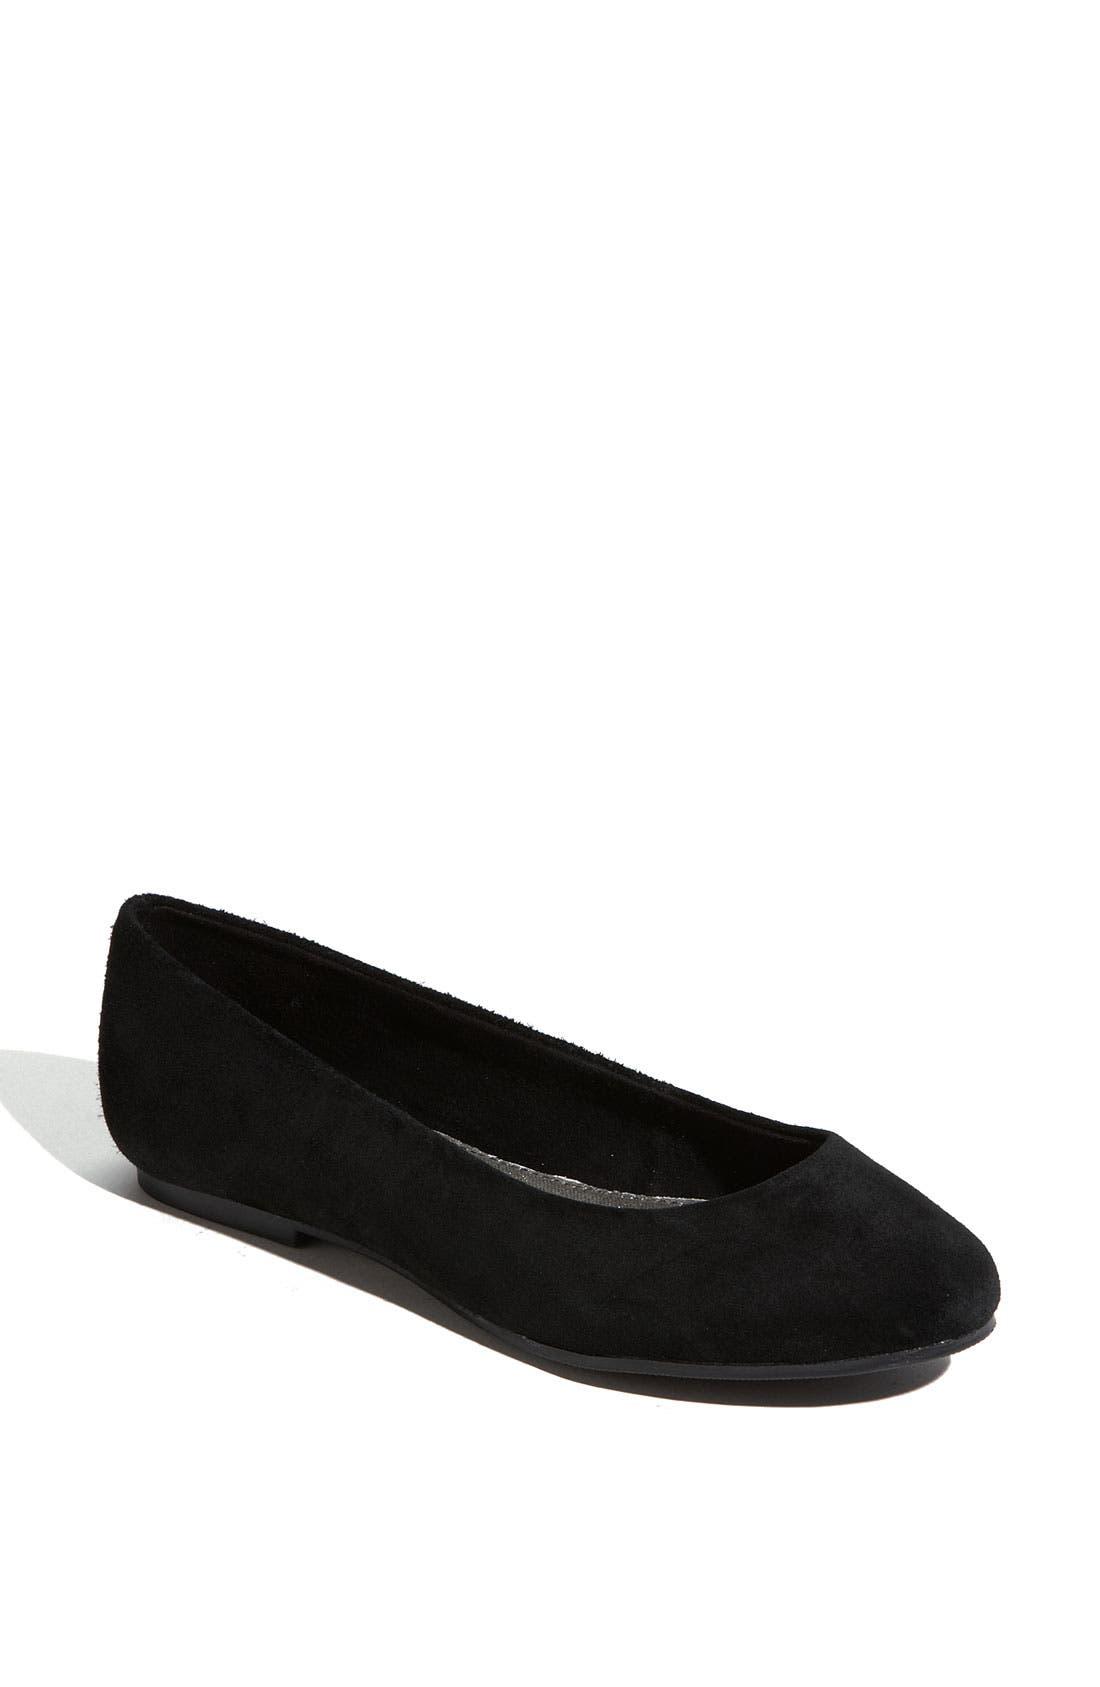 Main Image - BC Footwear 'Limousine' Suede Flat